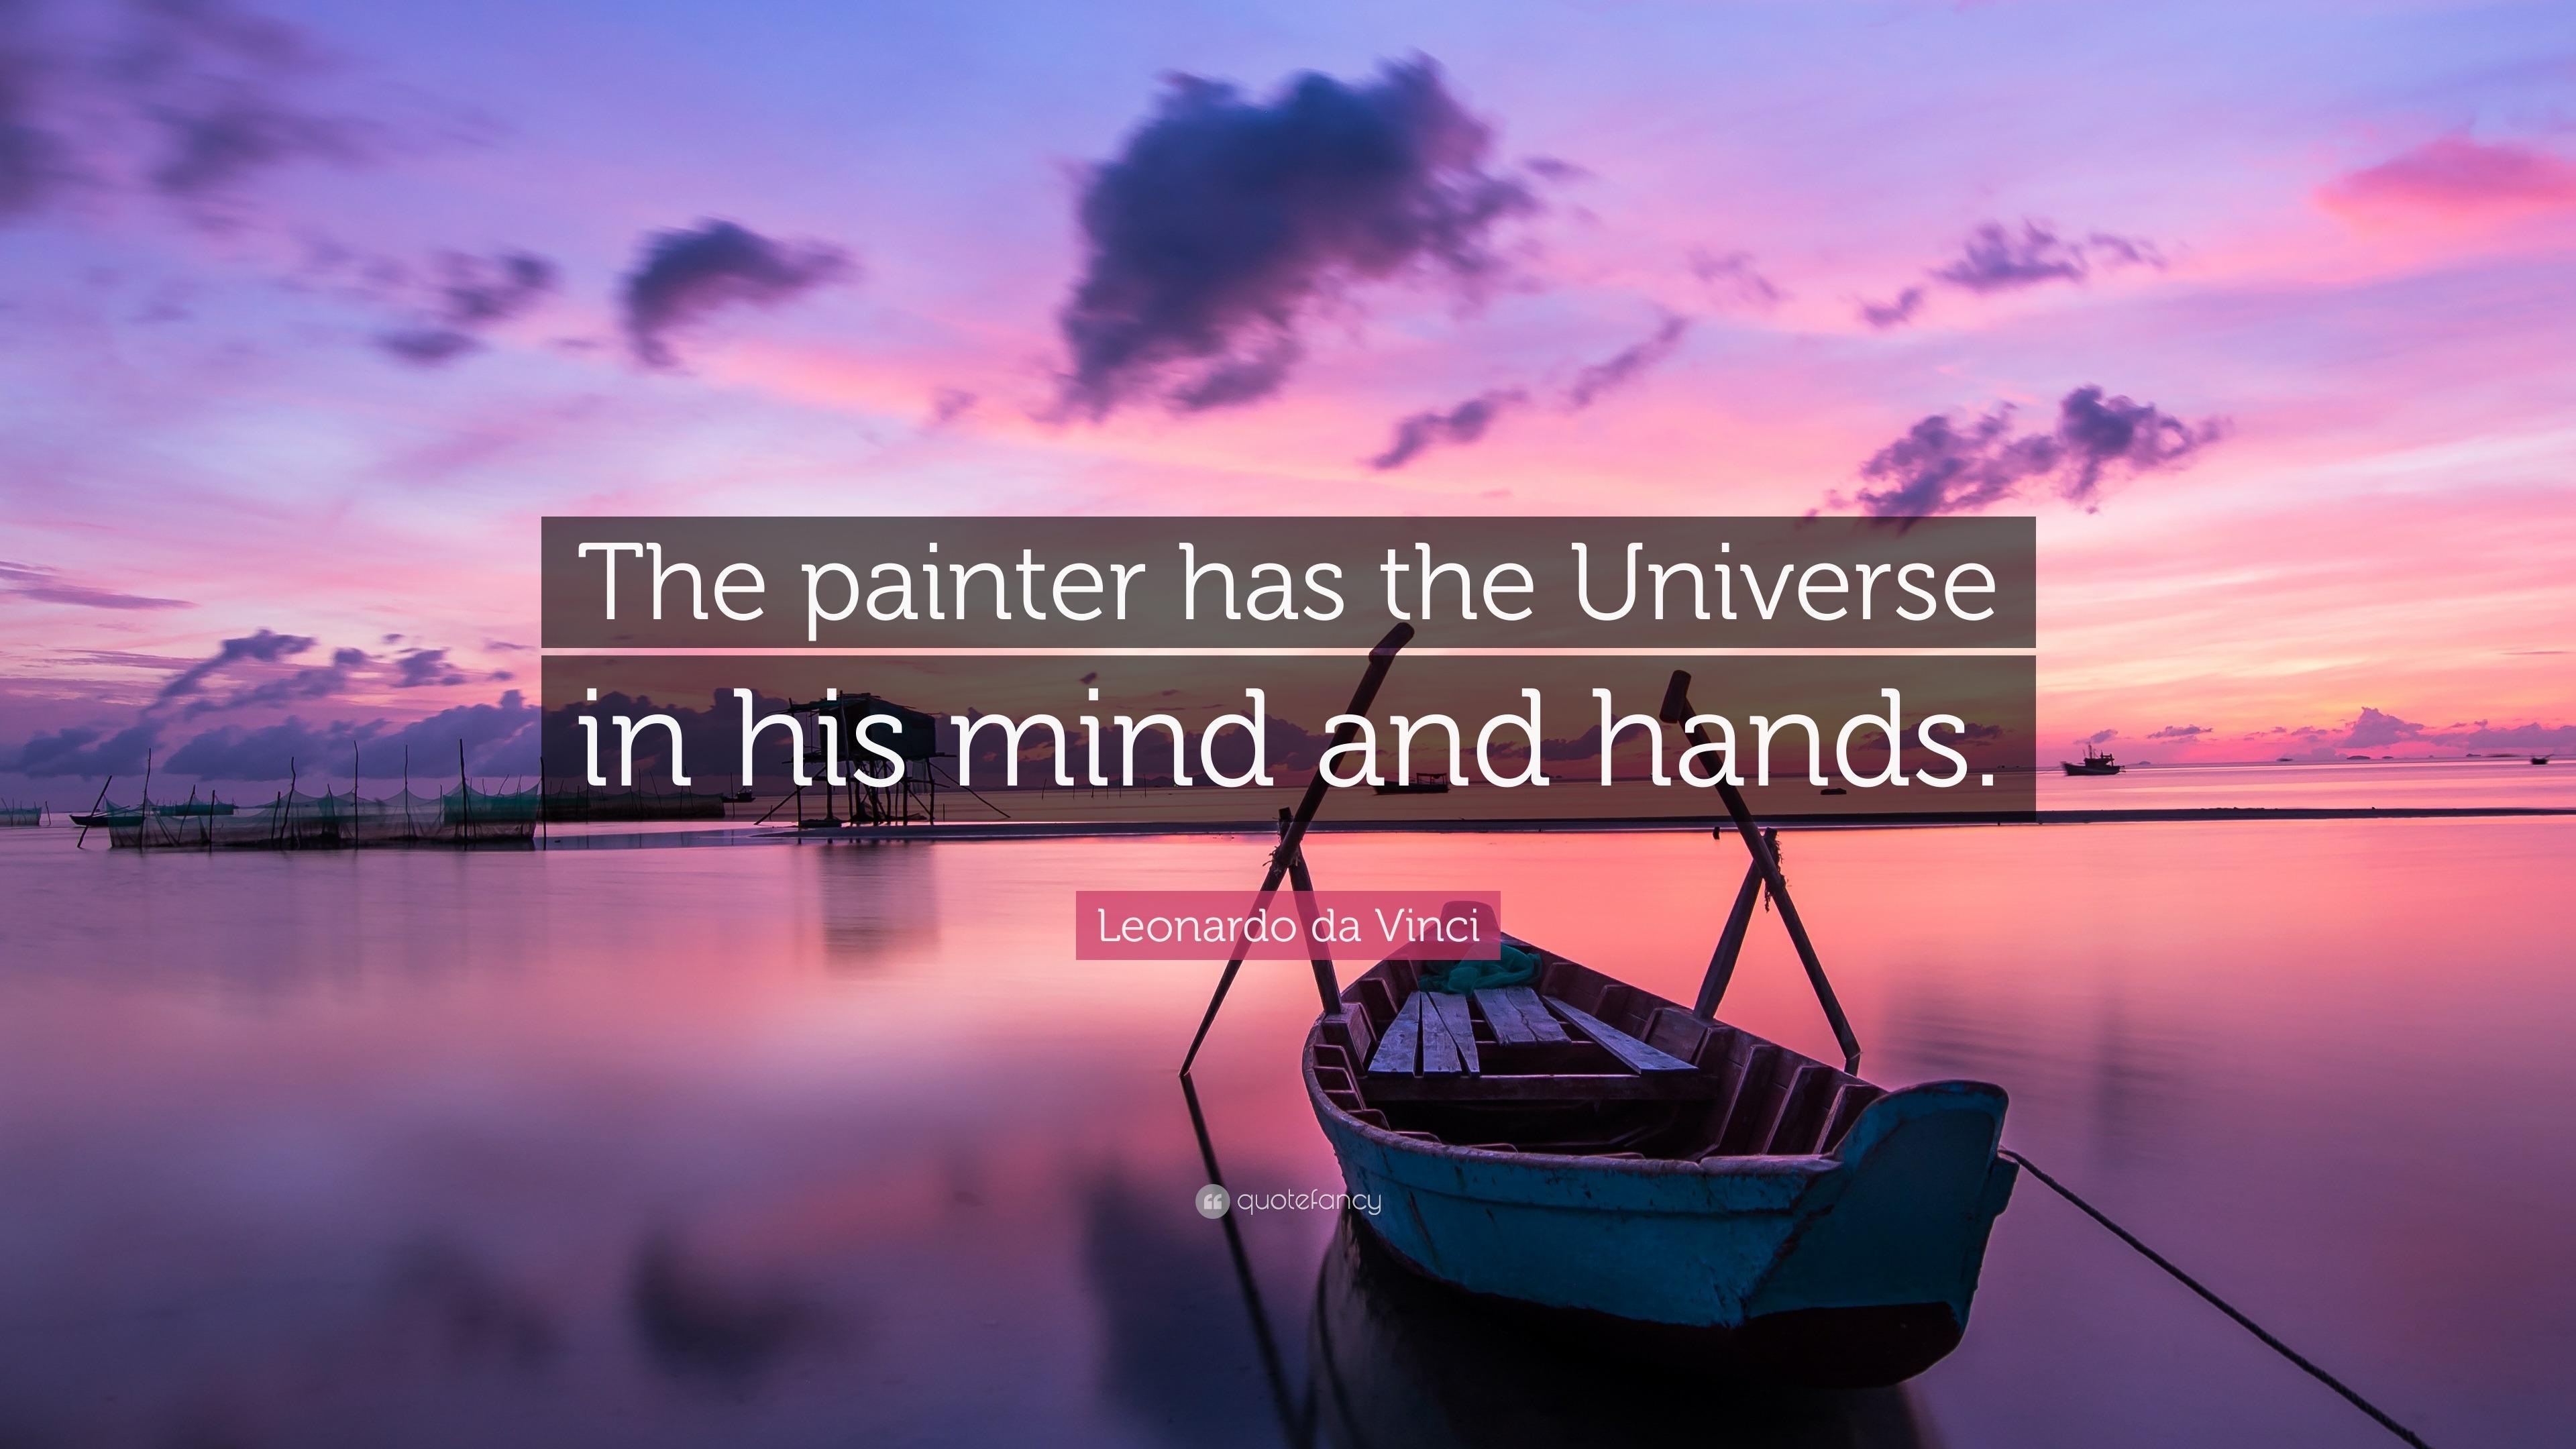 Vincent Van Gogh Quotes Wallpaper Leonardo Da Vinci Quote The Painter Has The Universe In